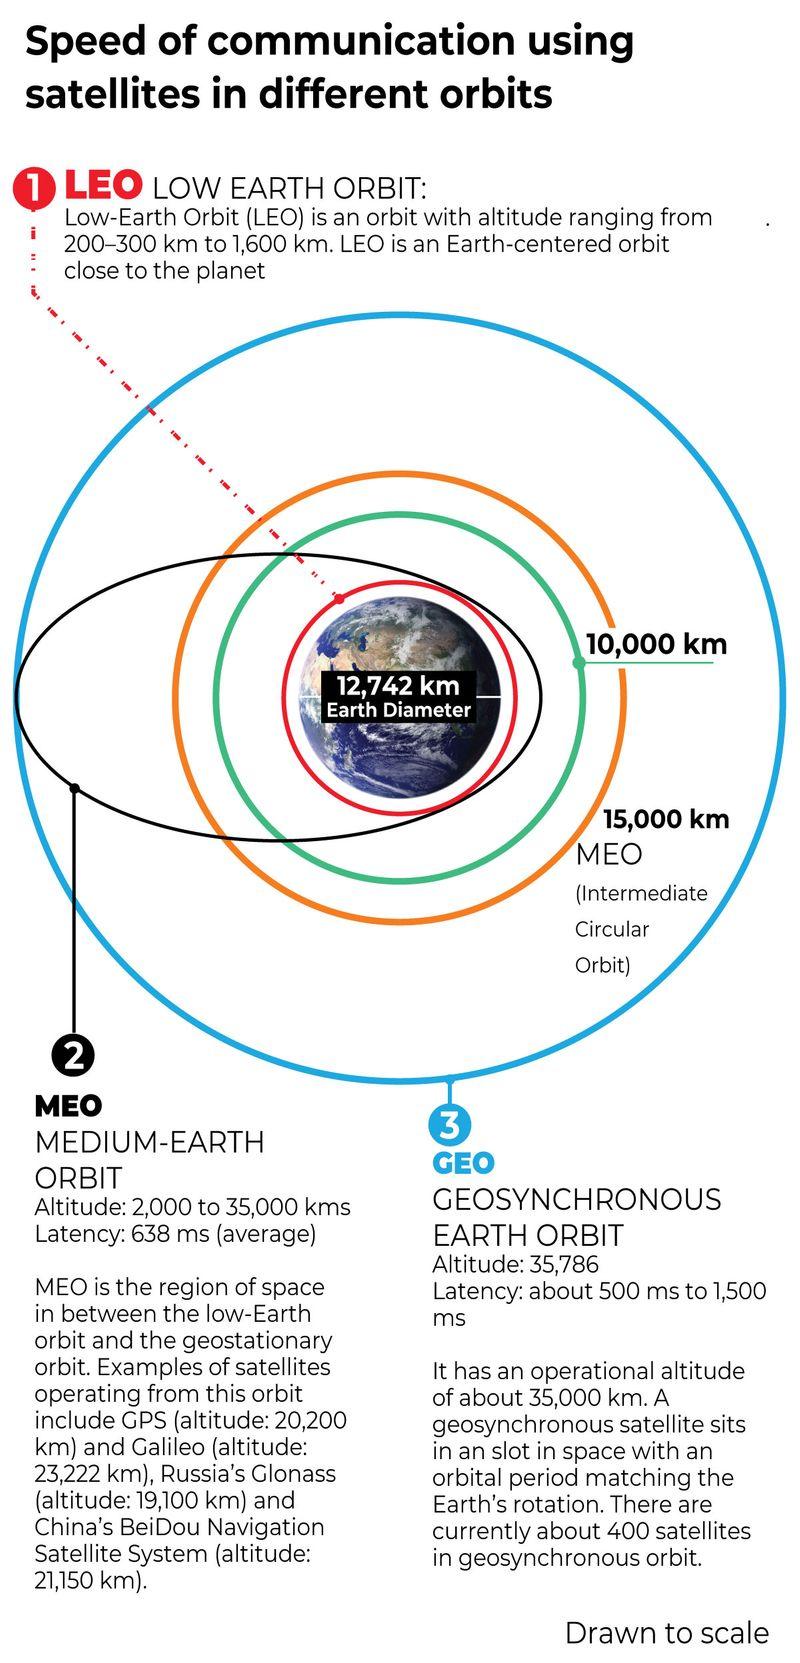 LEO MEO GEO satellites